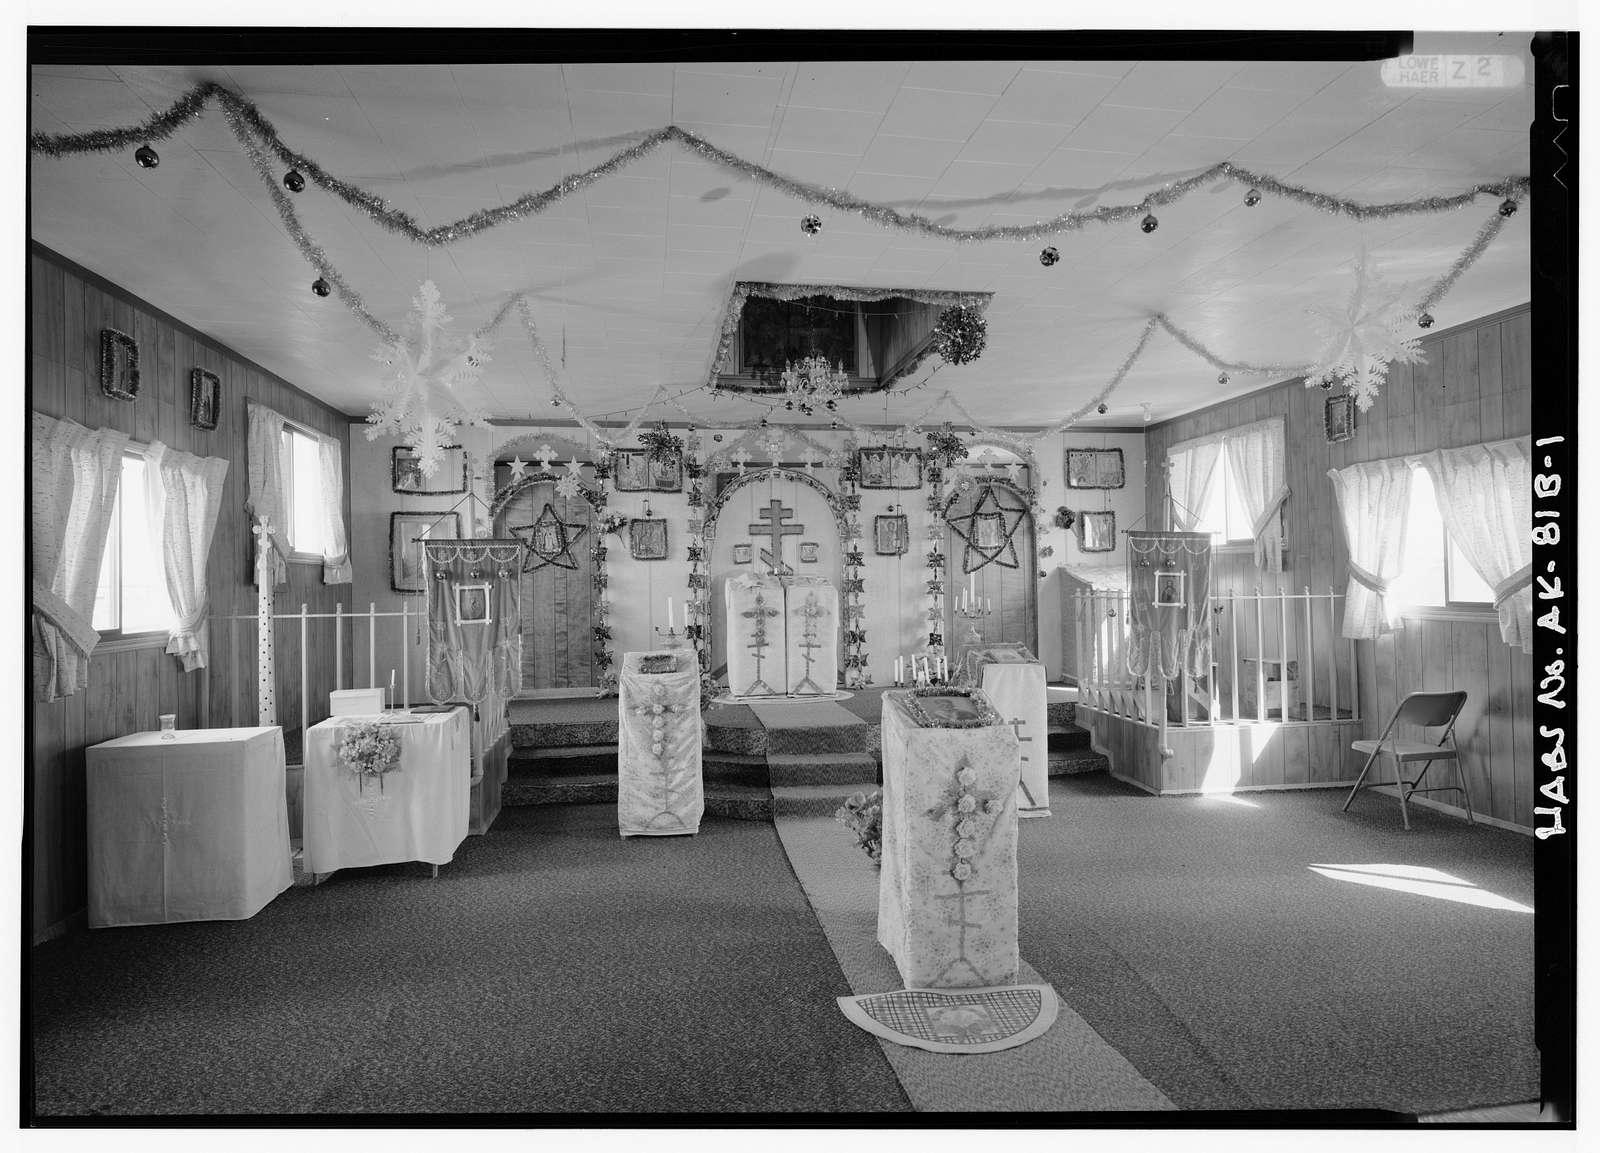 St. Nicholas Russian Orthodox Churches, New Church, Igiugig, Lake & Peninsula Borough, AK